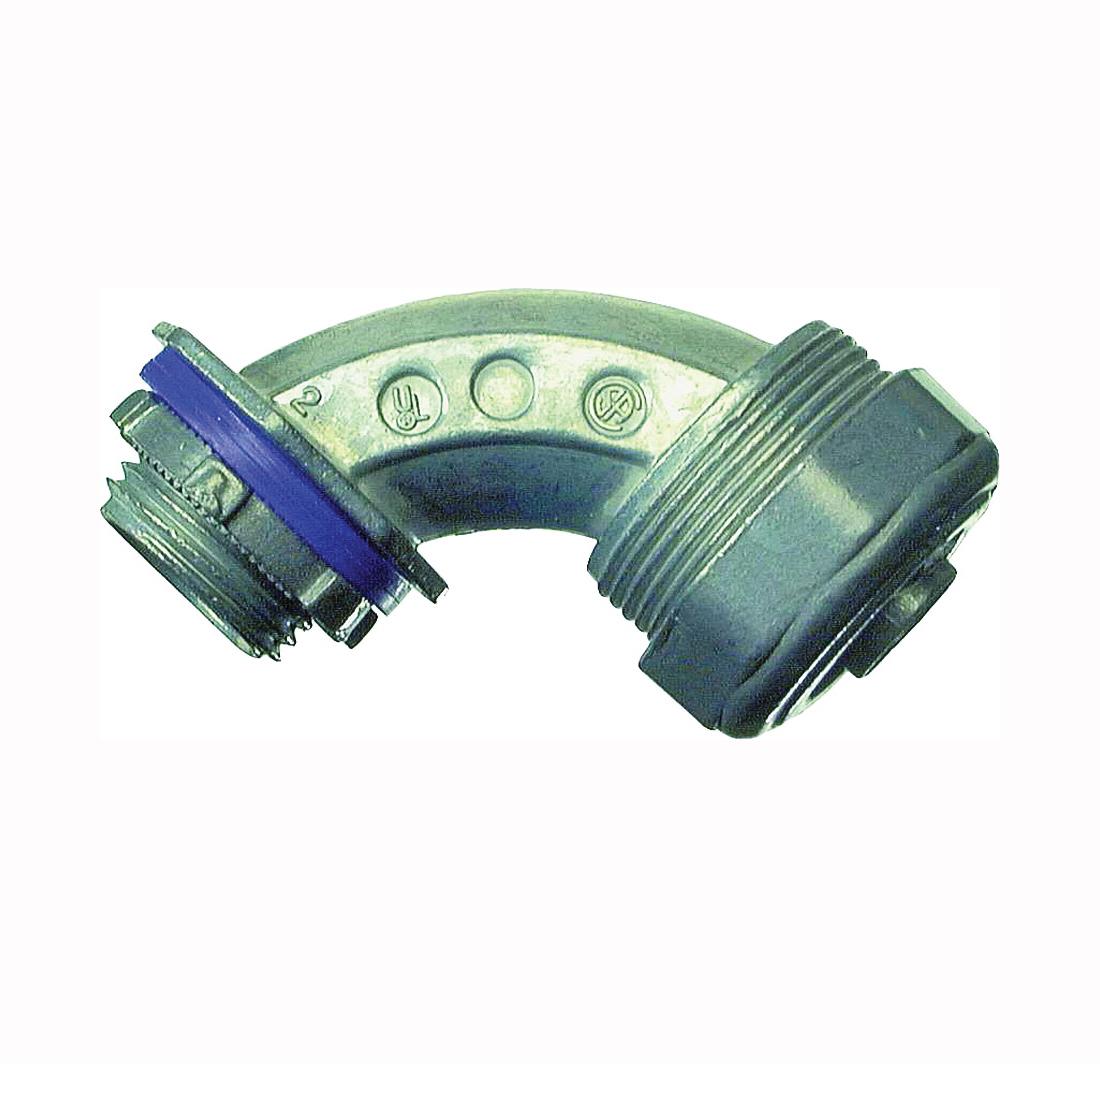 Picture of Halex 16910 Conduit Elbow, 90 deg Angle, 1 in Trade, Compression, Plastic